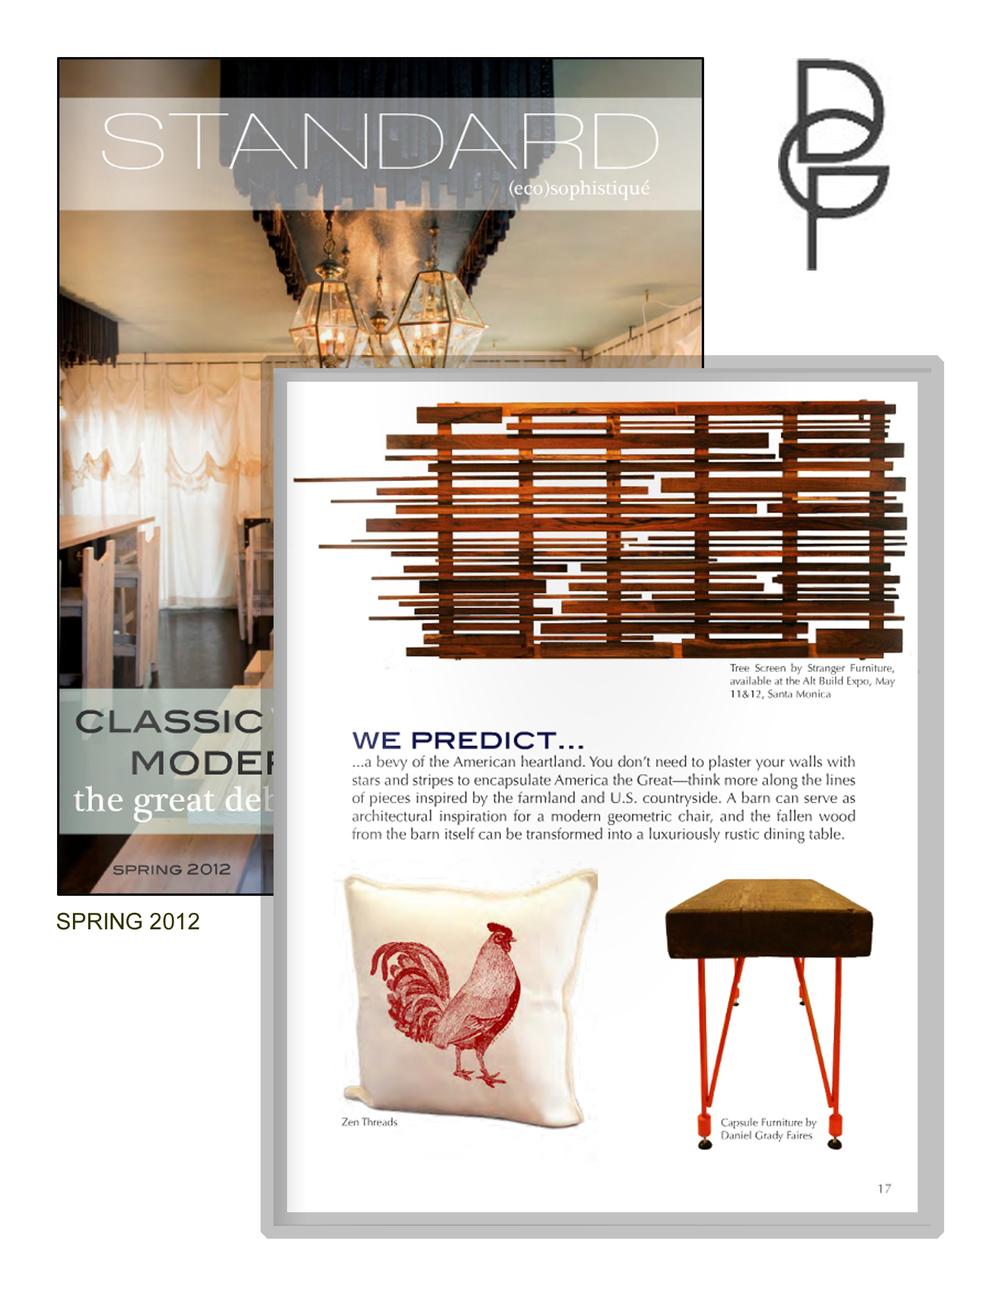 StandardMagazine_Spring2012_CapsuleEdit.jpg